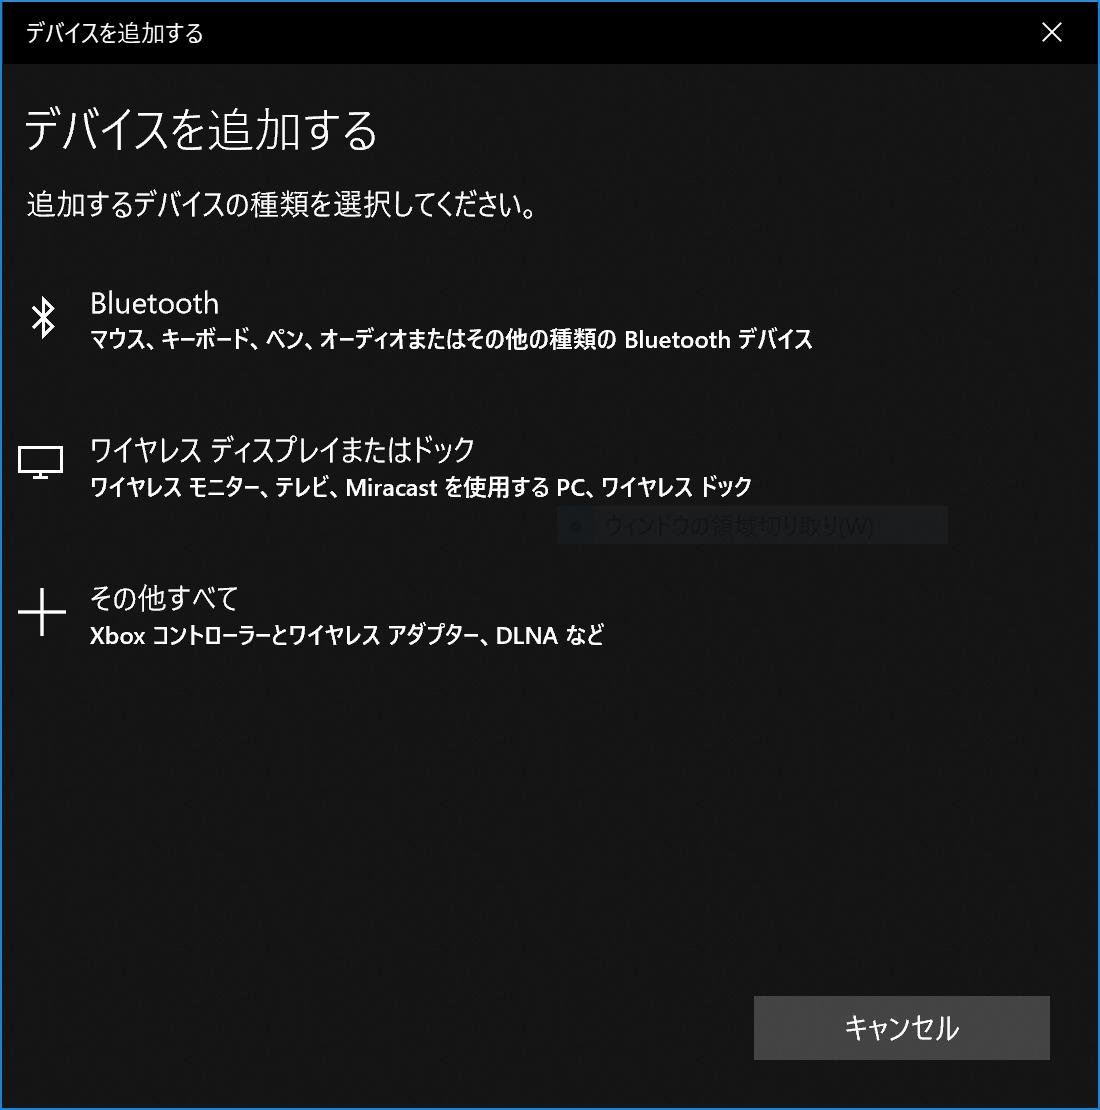 f:id:itokoichi:20190521160624p:plain